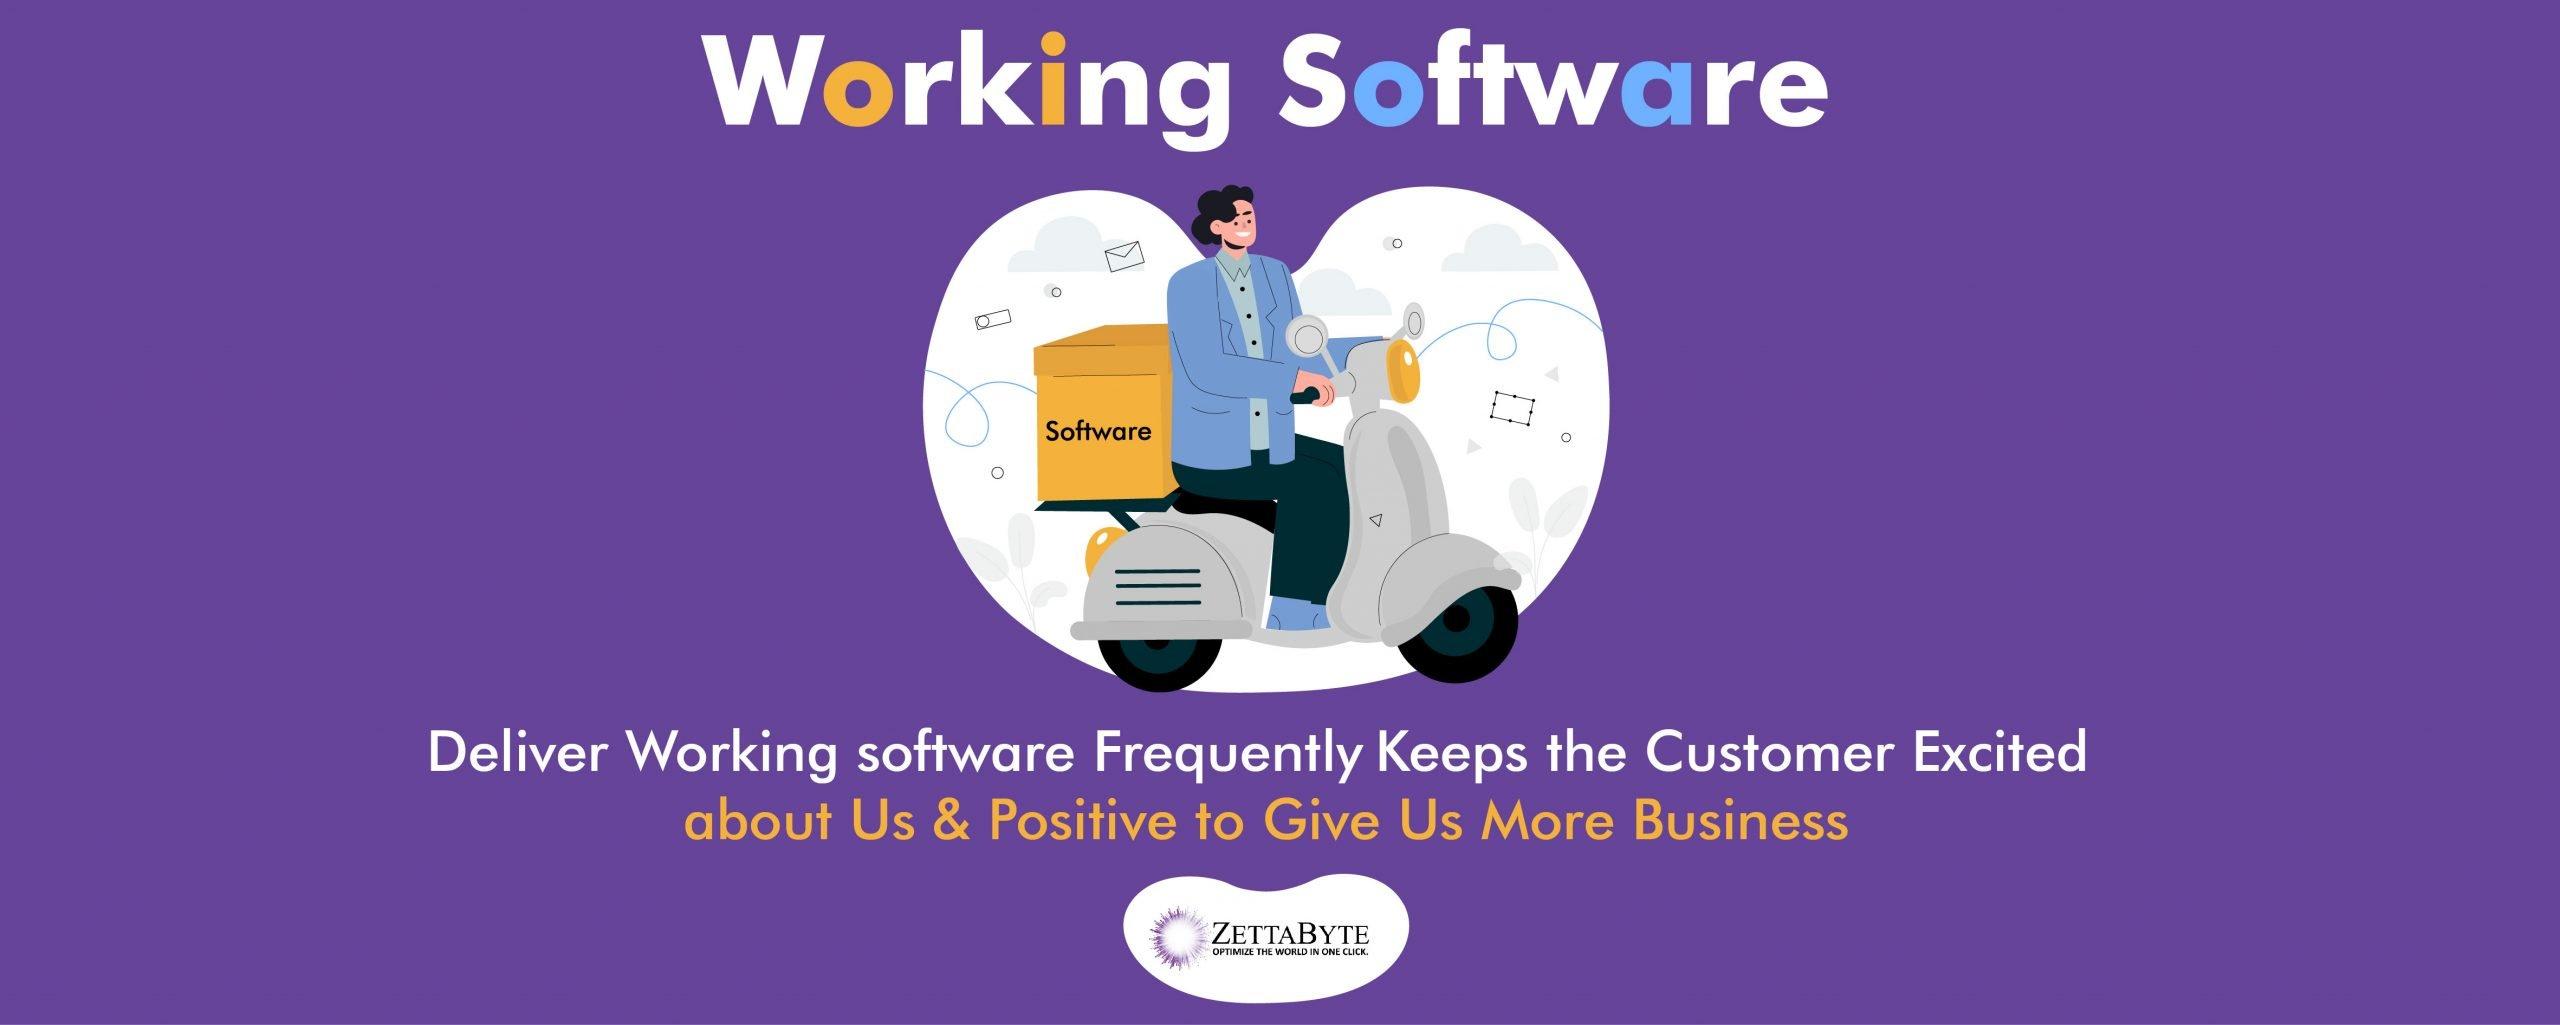 Copy of Slide_Value_05 Working Software